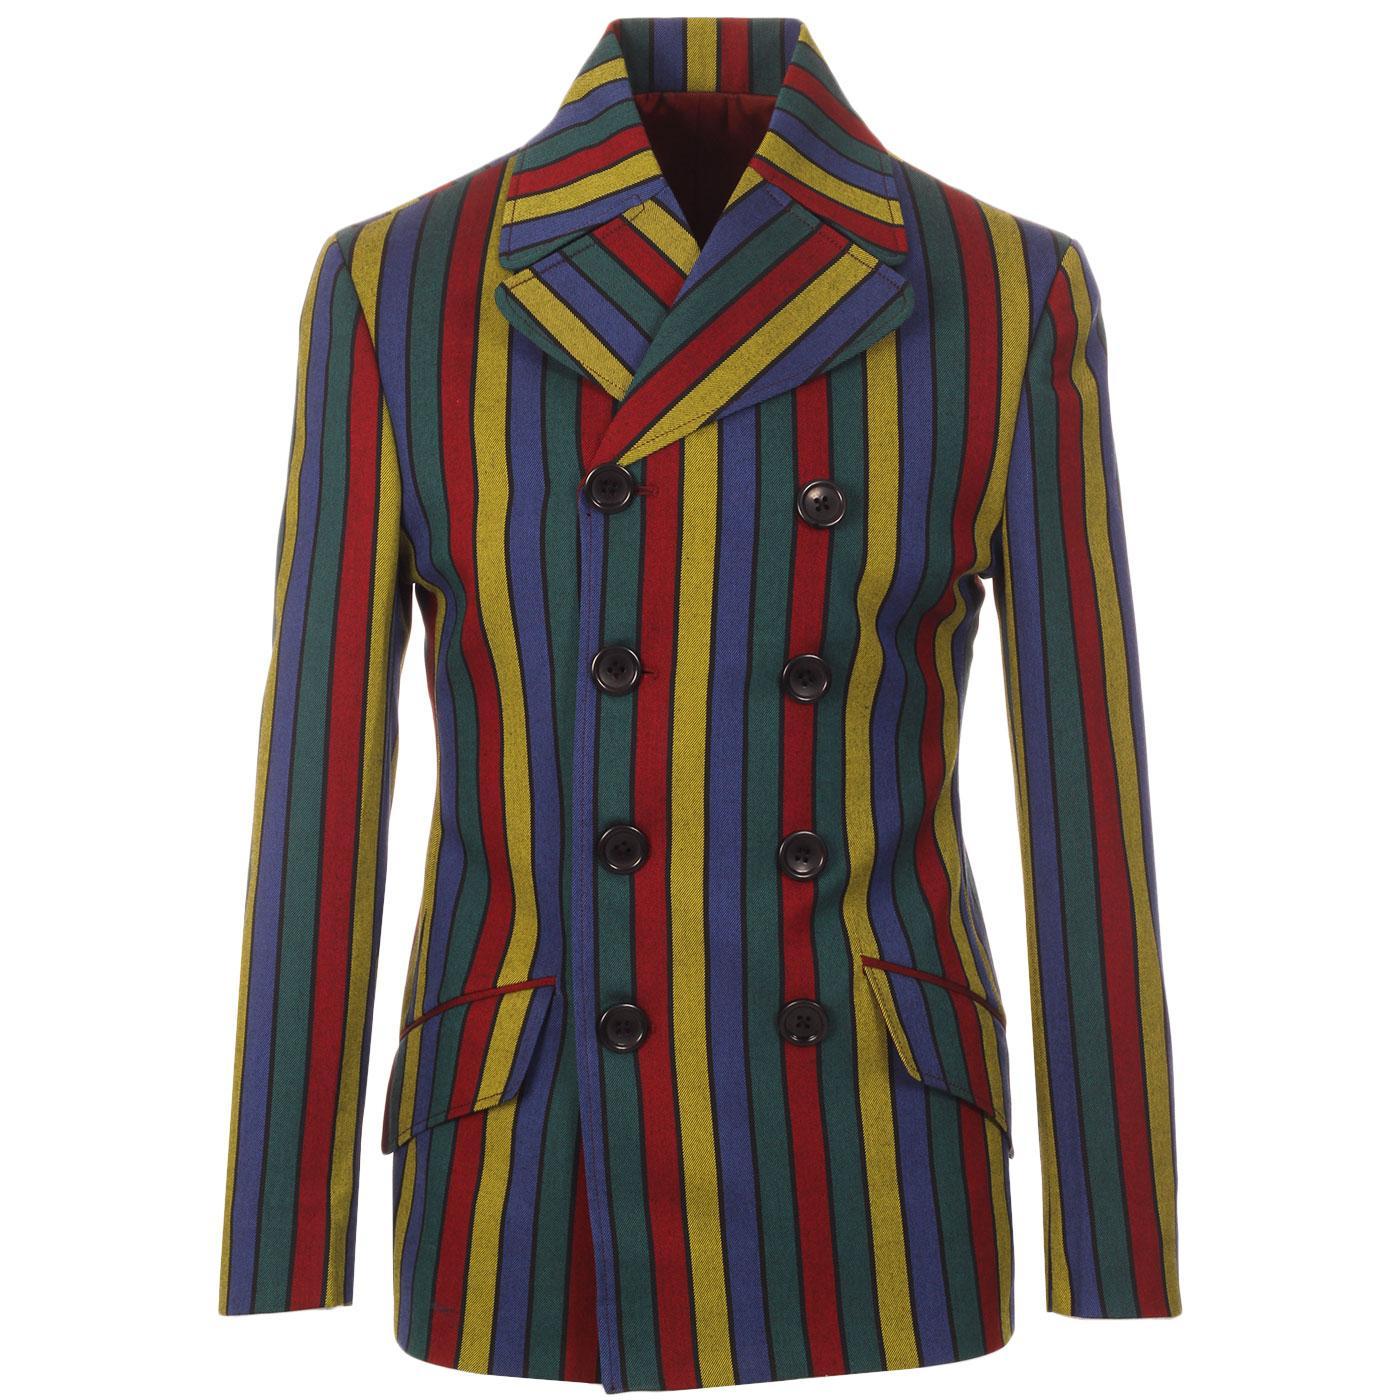 Madcap England Rare Breed Hendrix Stripe 60s Mod Double Breasted Blazer Jacket